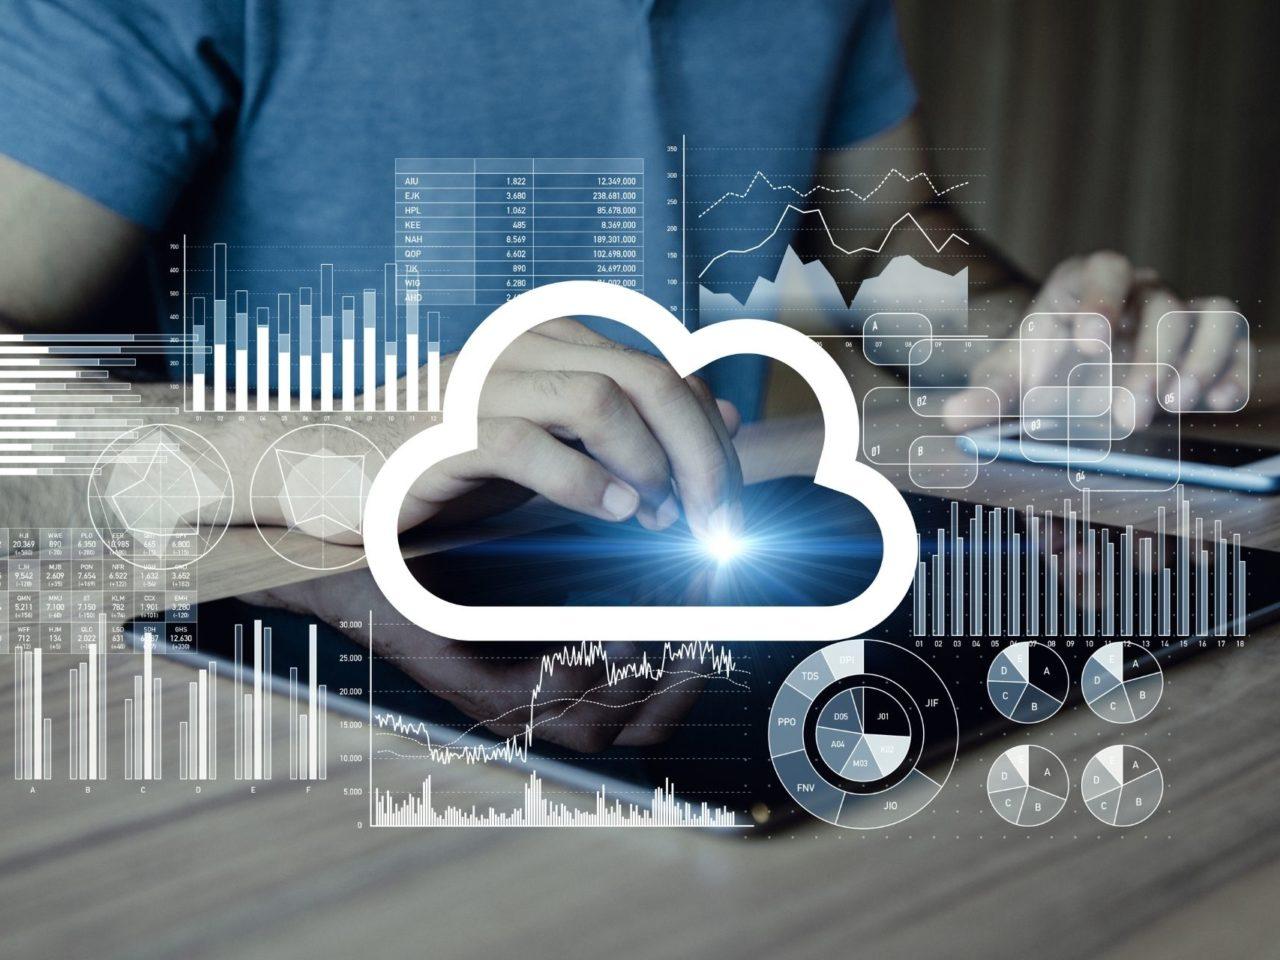 https://staffgiant.co.uk/wp-content/uploads/2021/03/Cloud-Engineer-1280x960.jpg